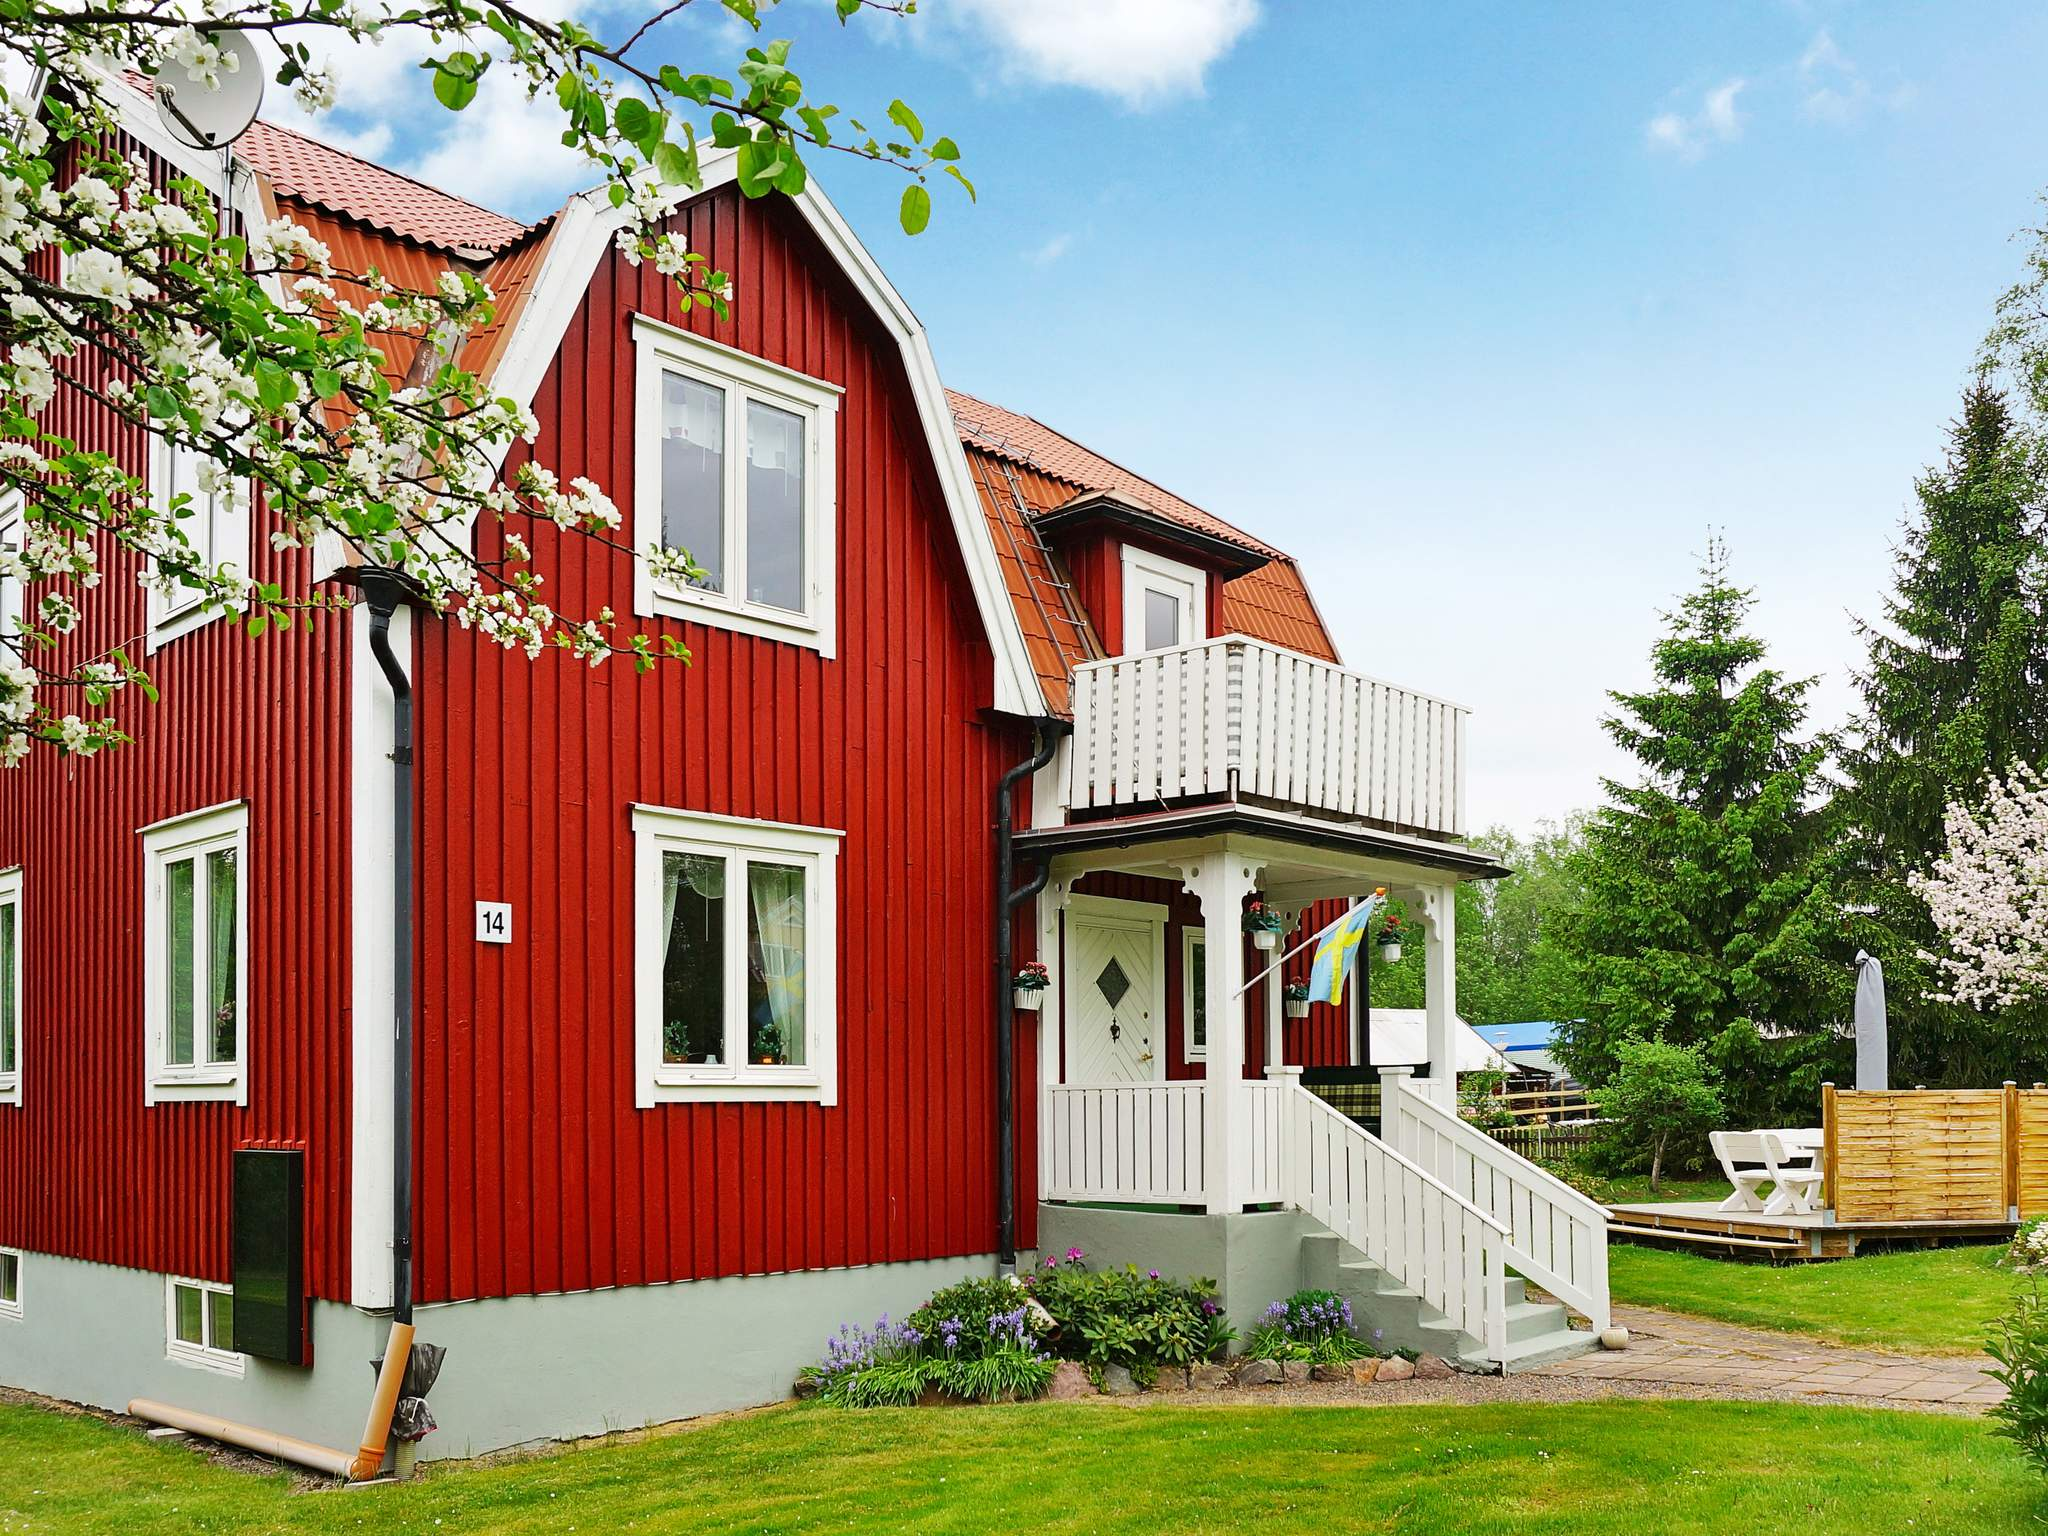 Ferienhaus Sandsjöfors (418764), Sandsjöfors, Jönköpings län, Südschweden, Schweden, Bild 17